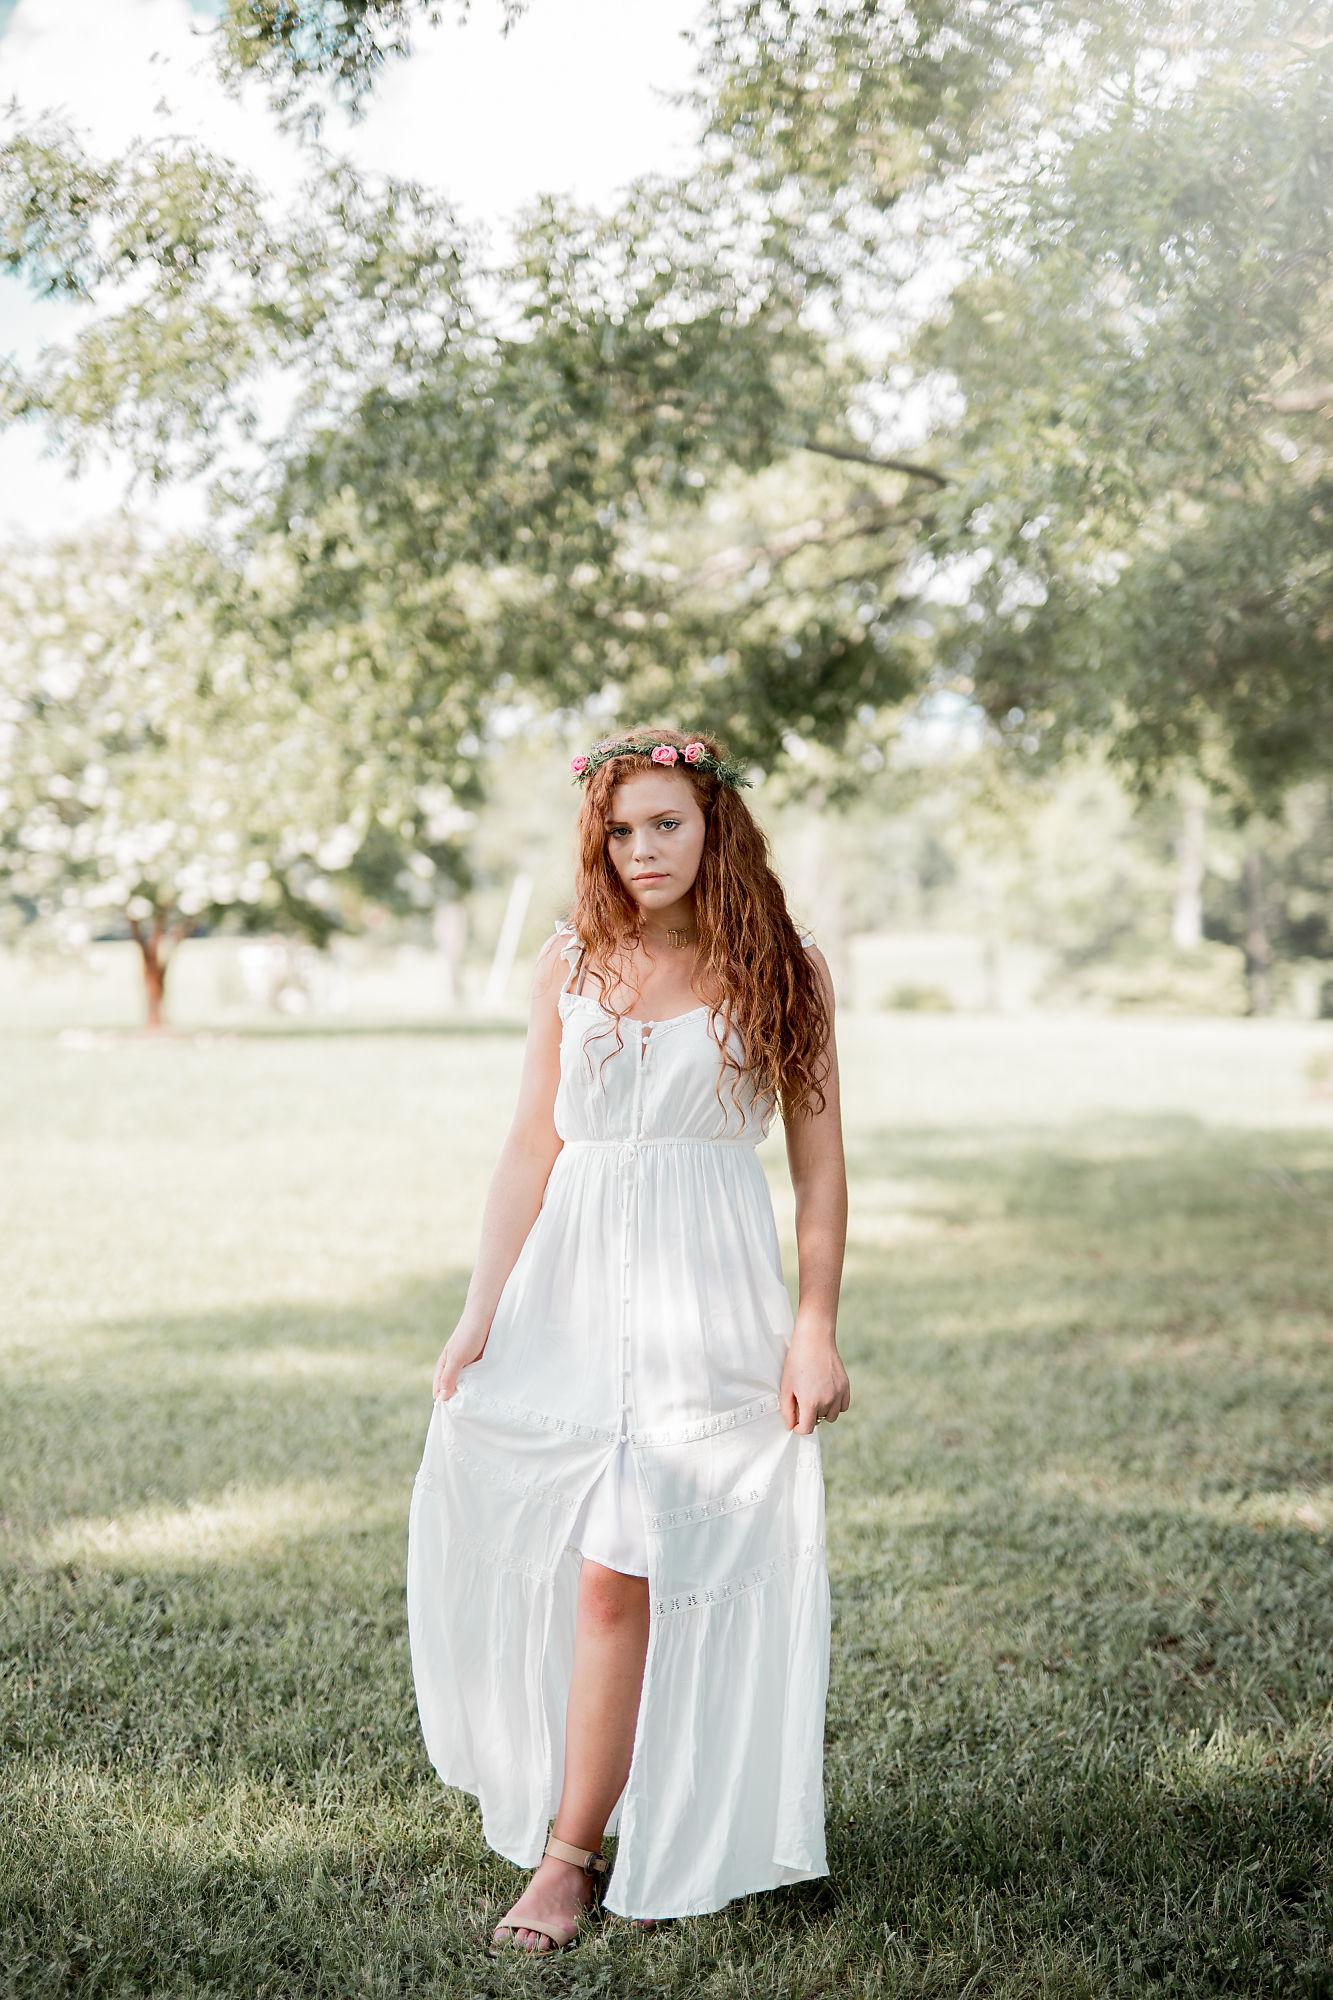 Raleigh Senior Photographer | www.foreveryoungandfree.com